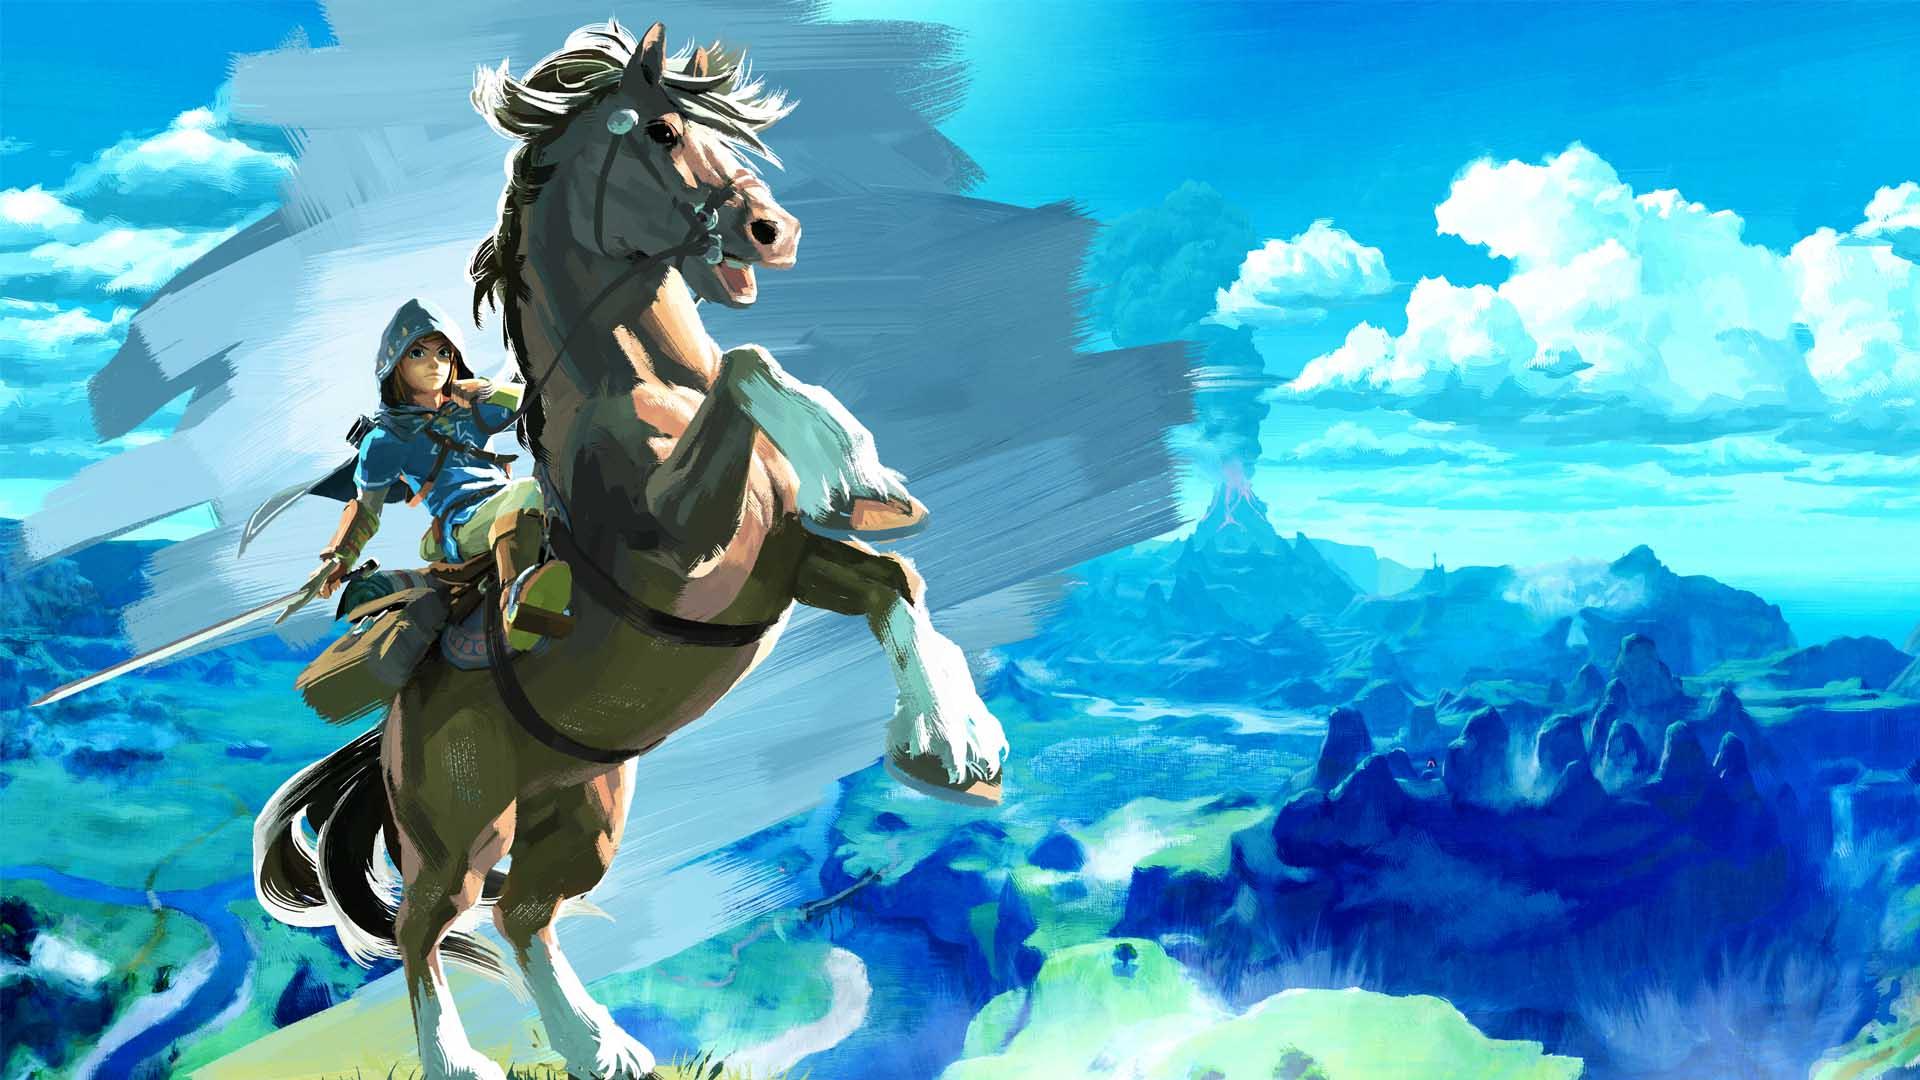 Breath Of The Wild Wallpaper Legend Of Zelda Breath Of The Wild